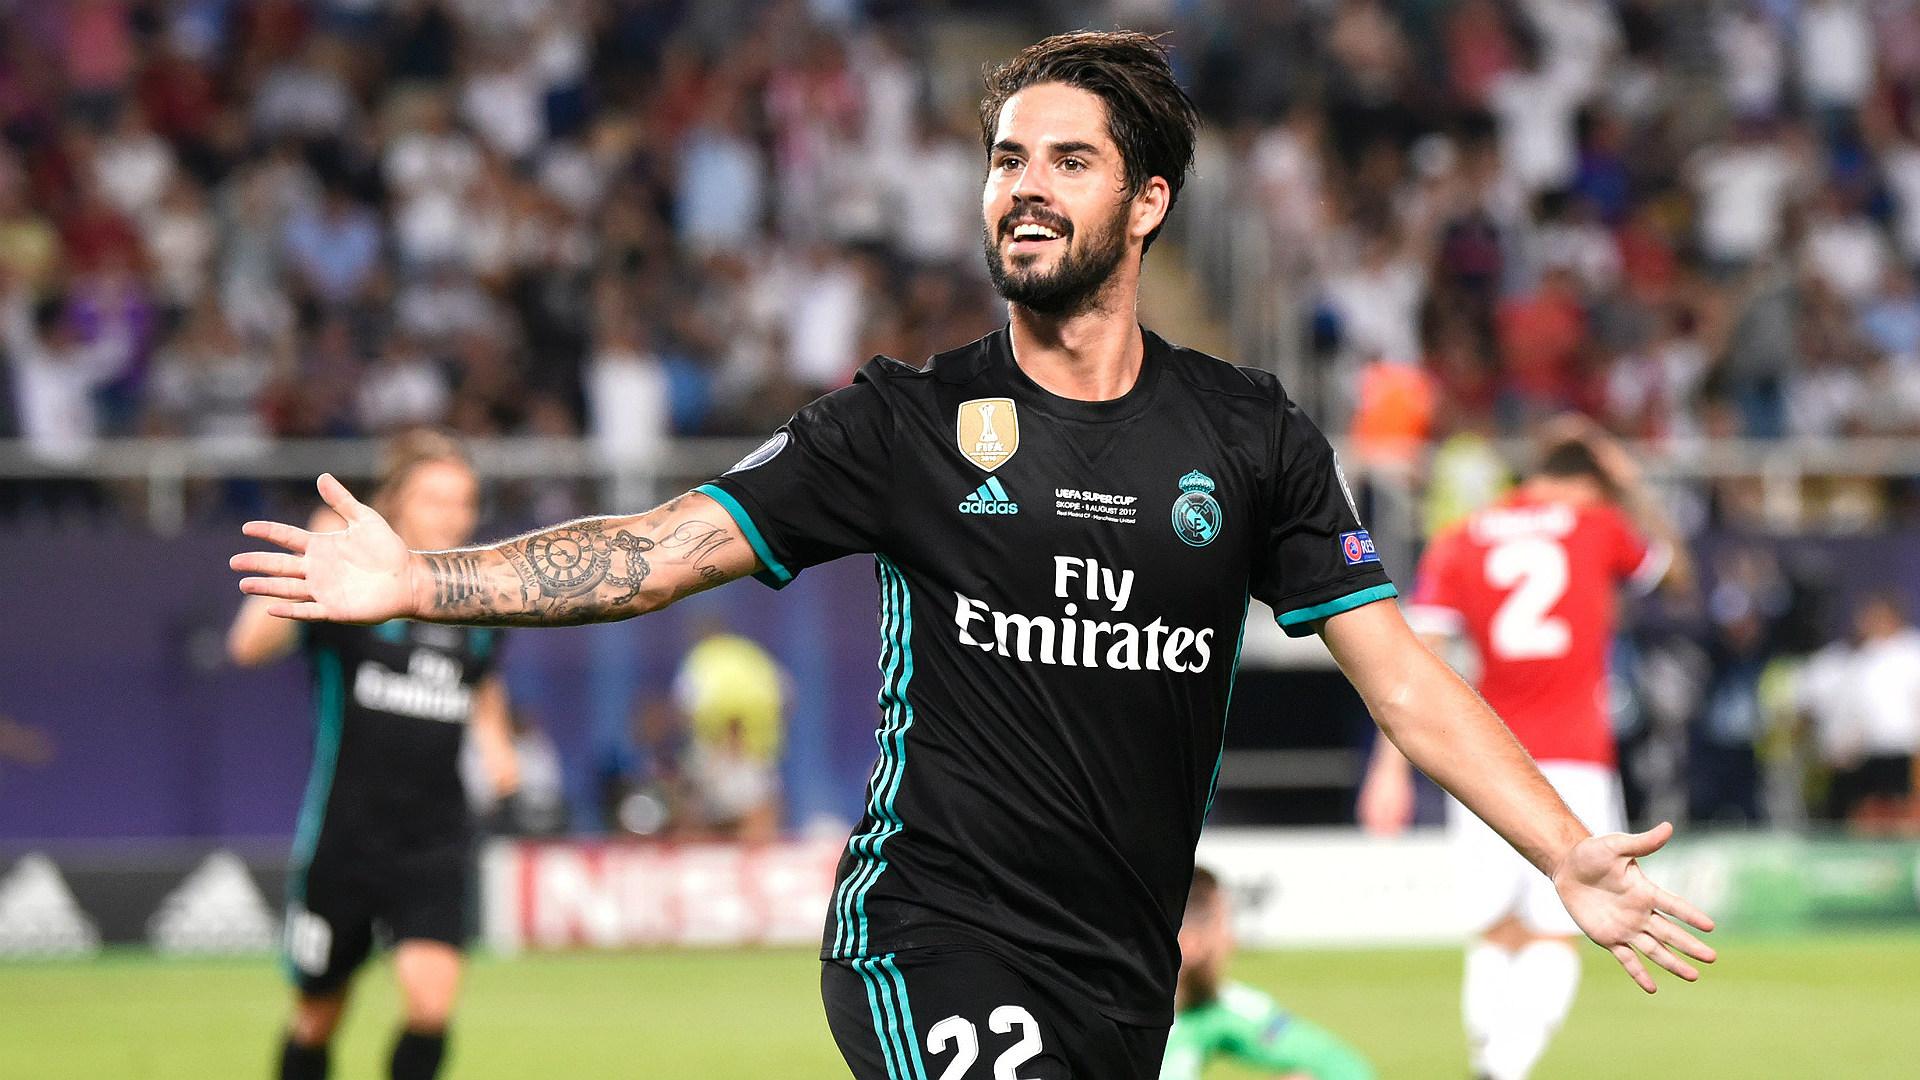 El crack del Real Madrid que no podrá jugar contra el Barcelona